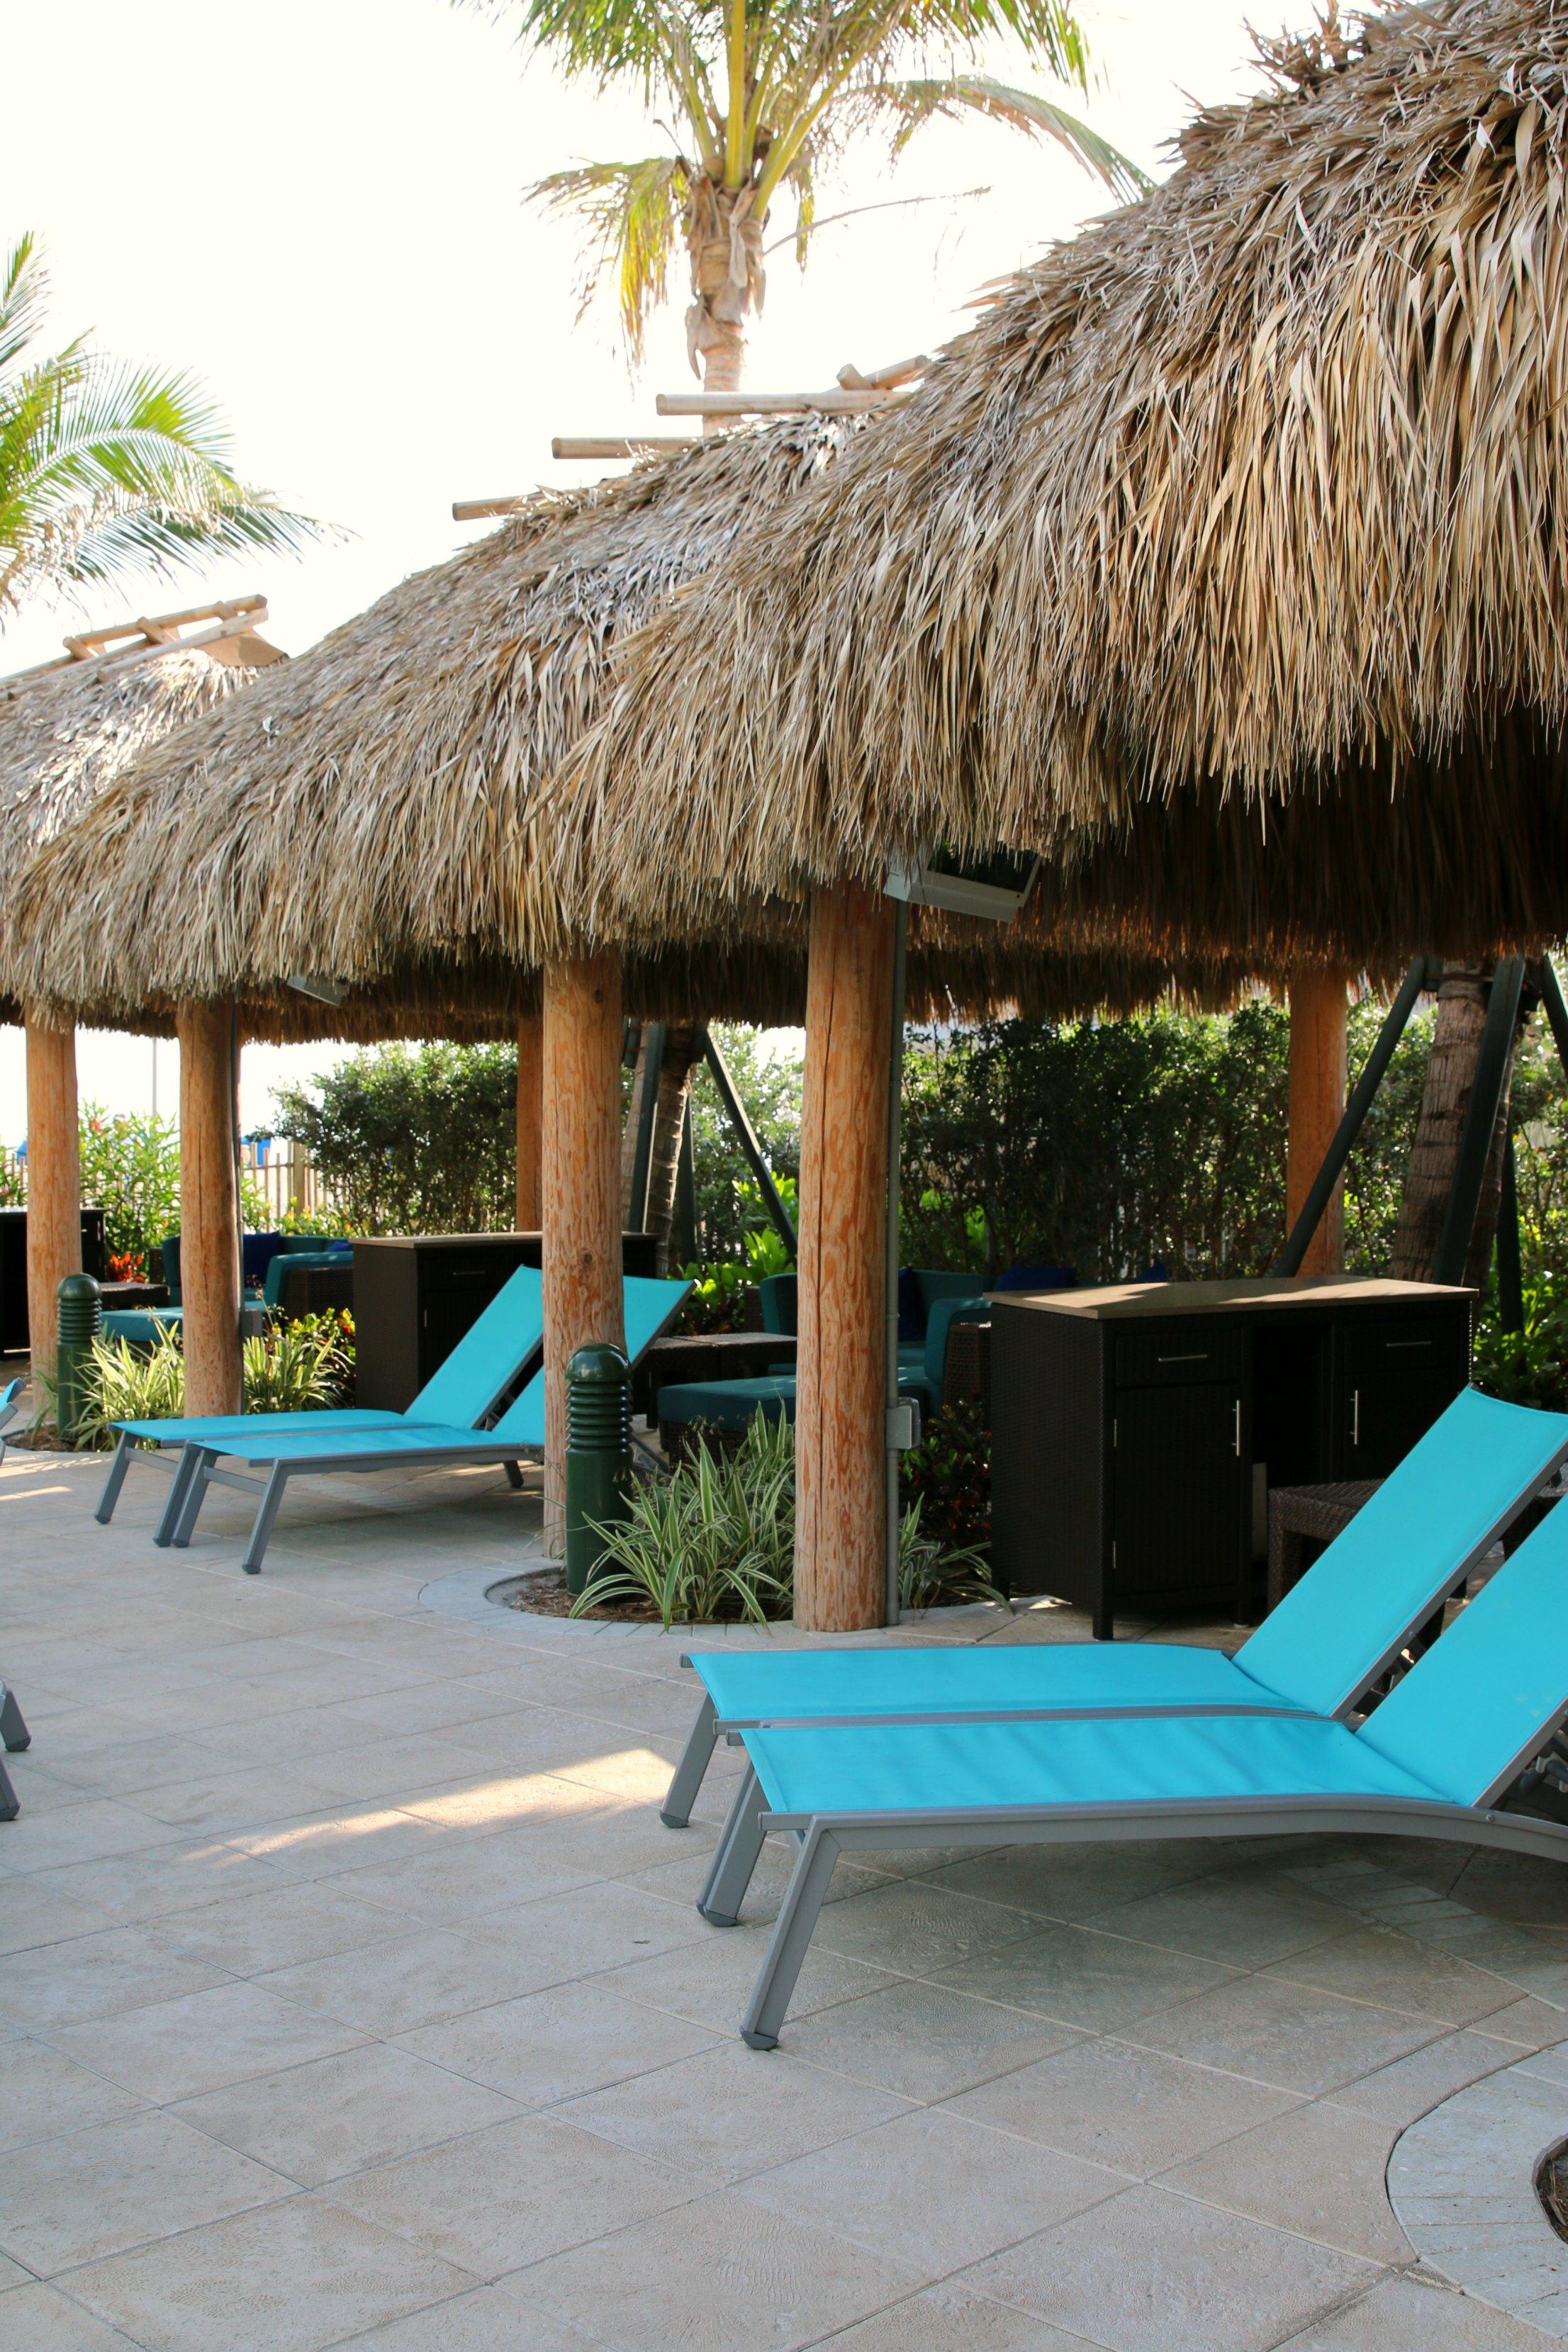 Margaritaville Hollywood Beach Resort Cabana